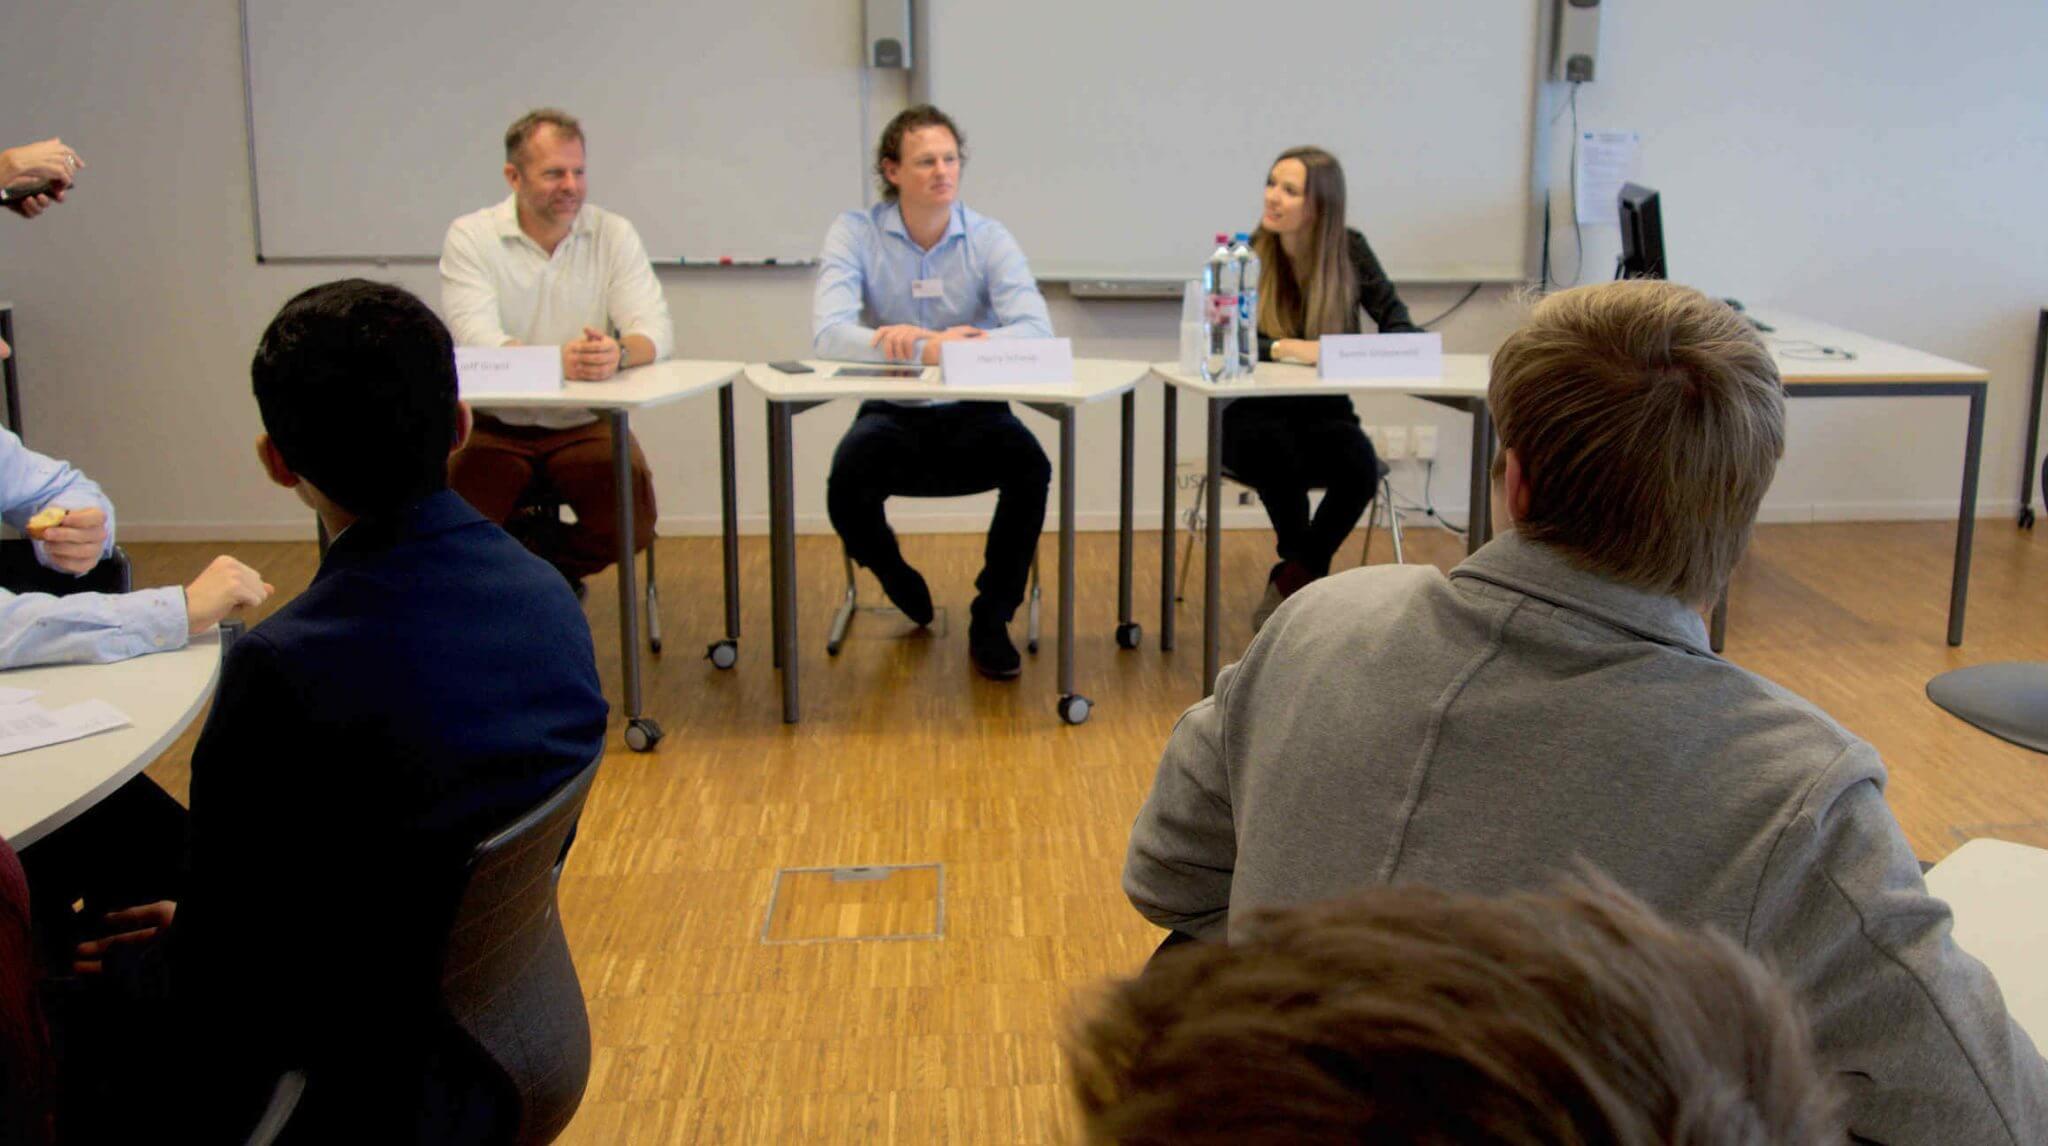 Inspiring 10th Graders to Pursue an Entrepreneurial Career